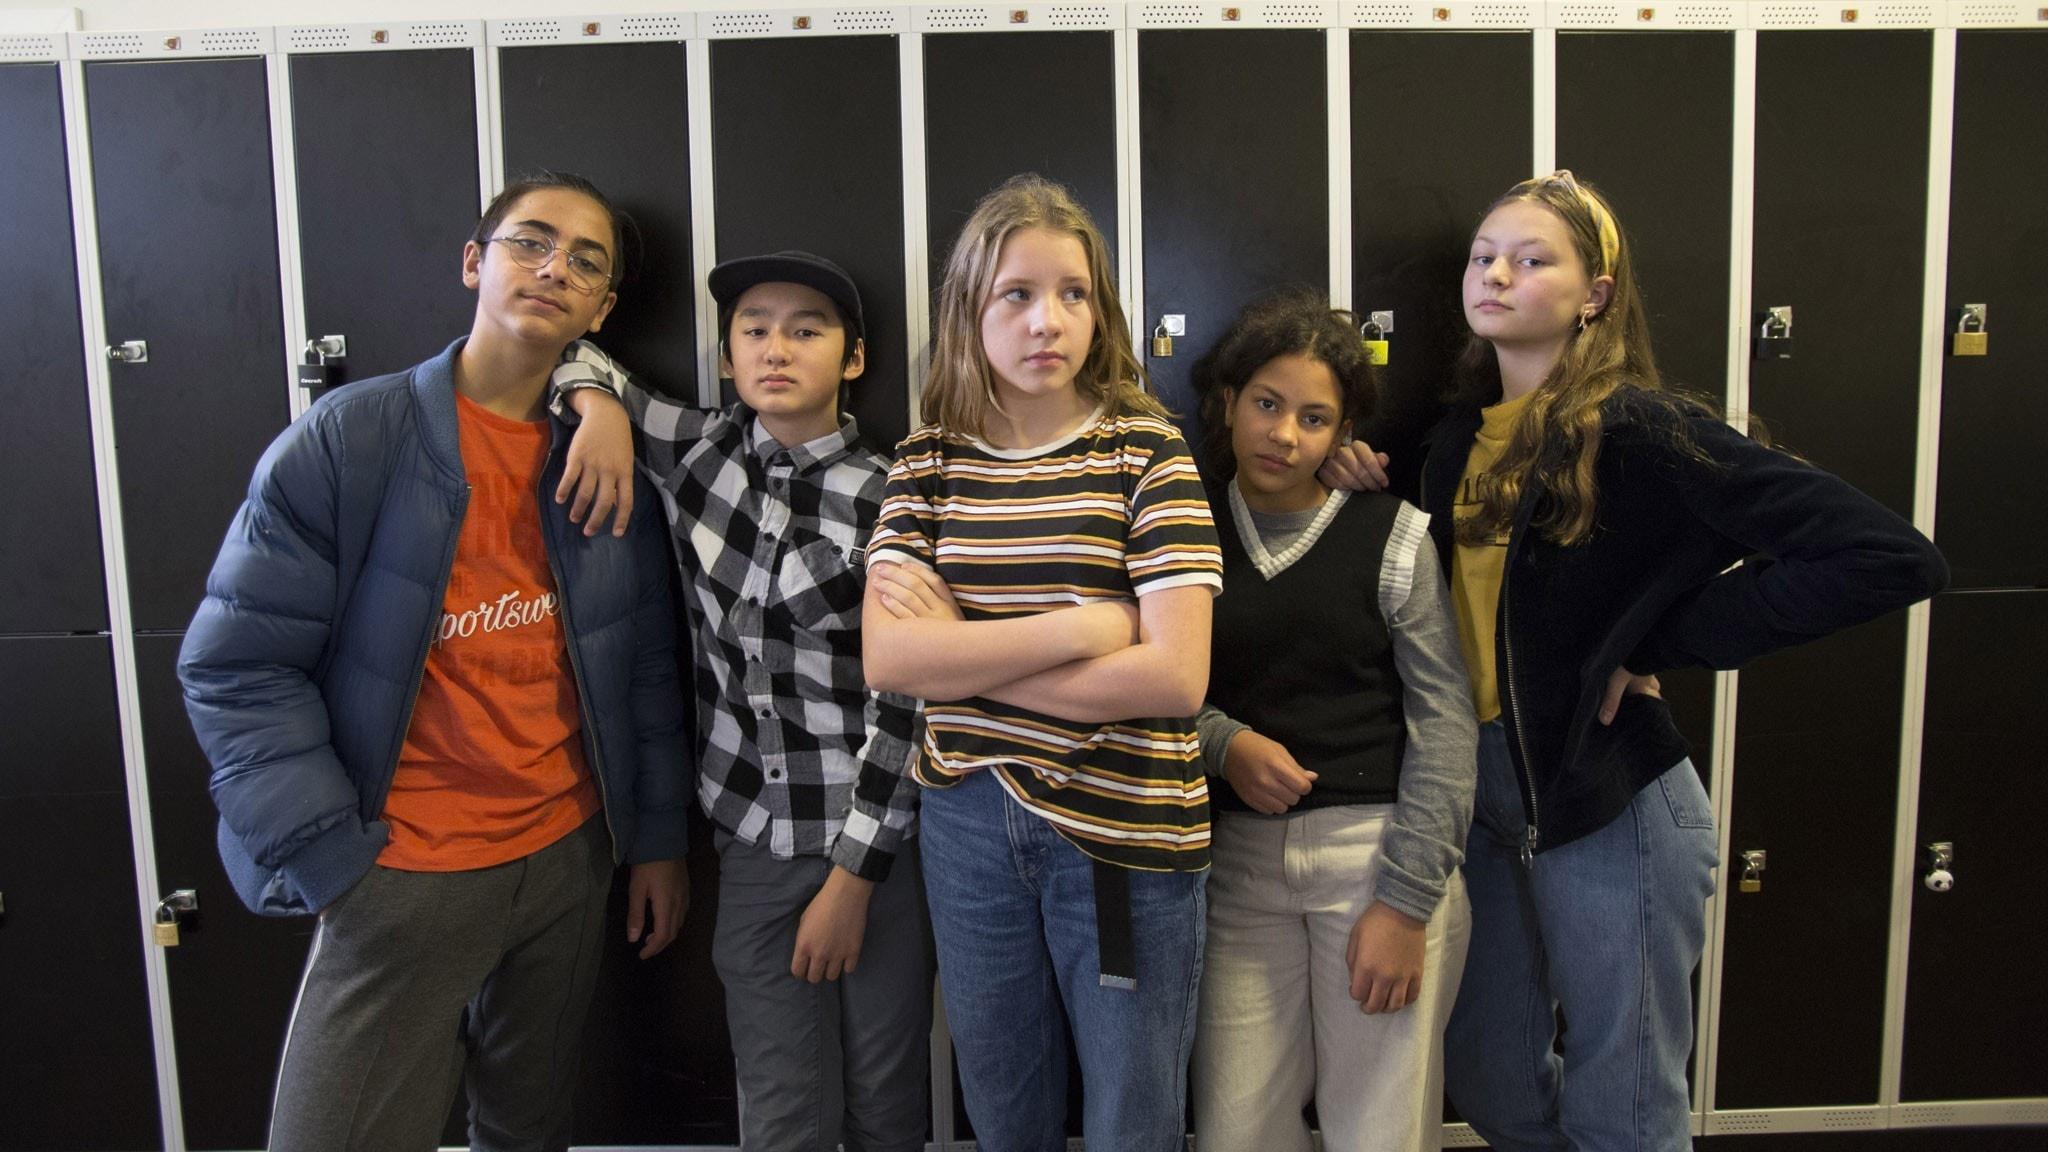 Parsa Jabarzare som Kian, Nathanael Karlsson som Eddie, Siri Södergren som Ziggy, Glenda Wade som Parvin och Kerstin Carlsson som Stella.